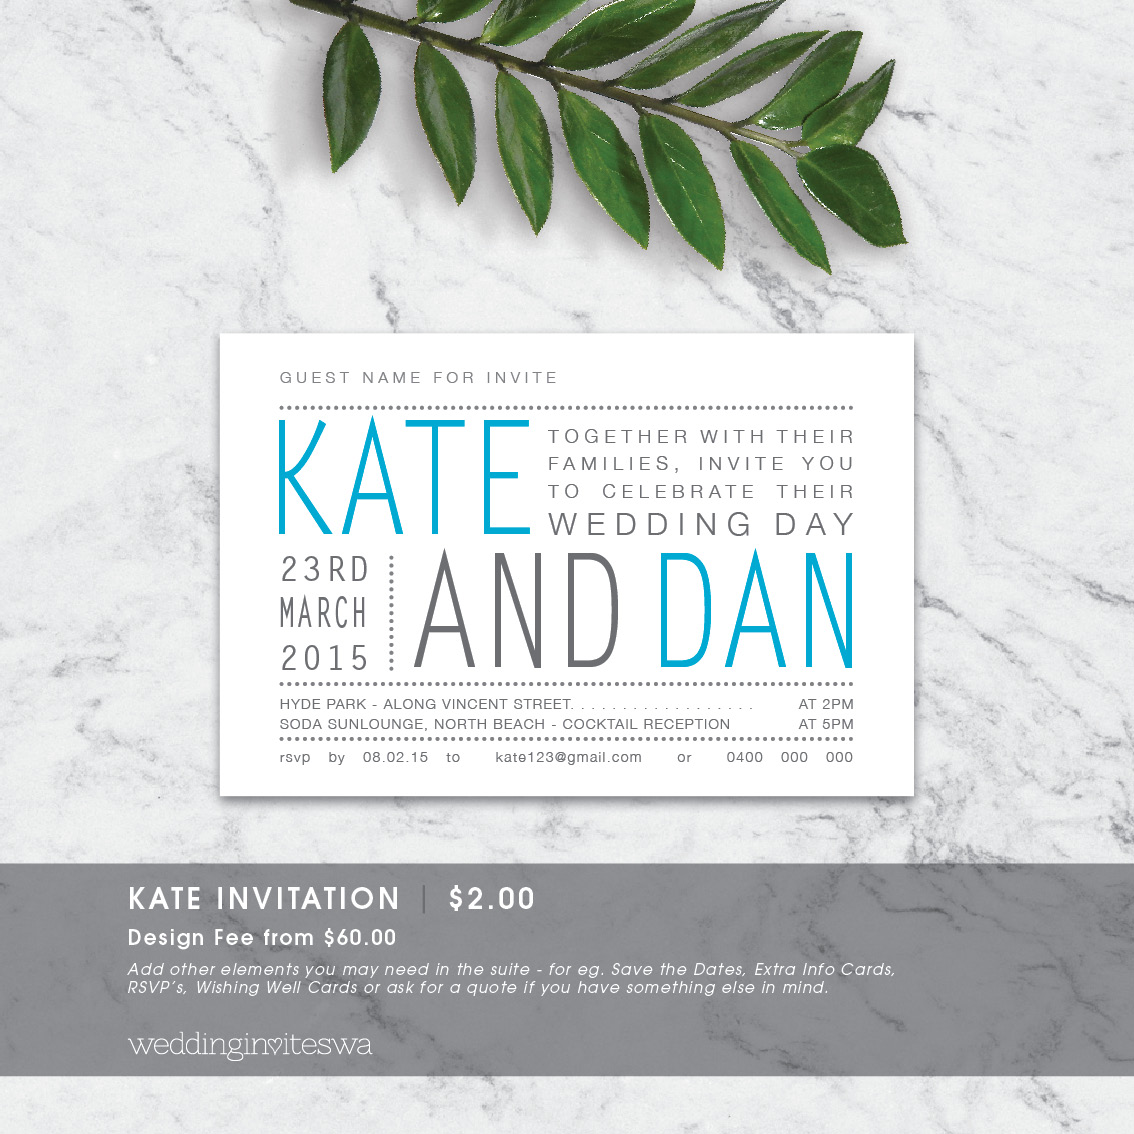 KATE_invite